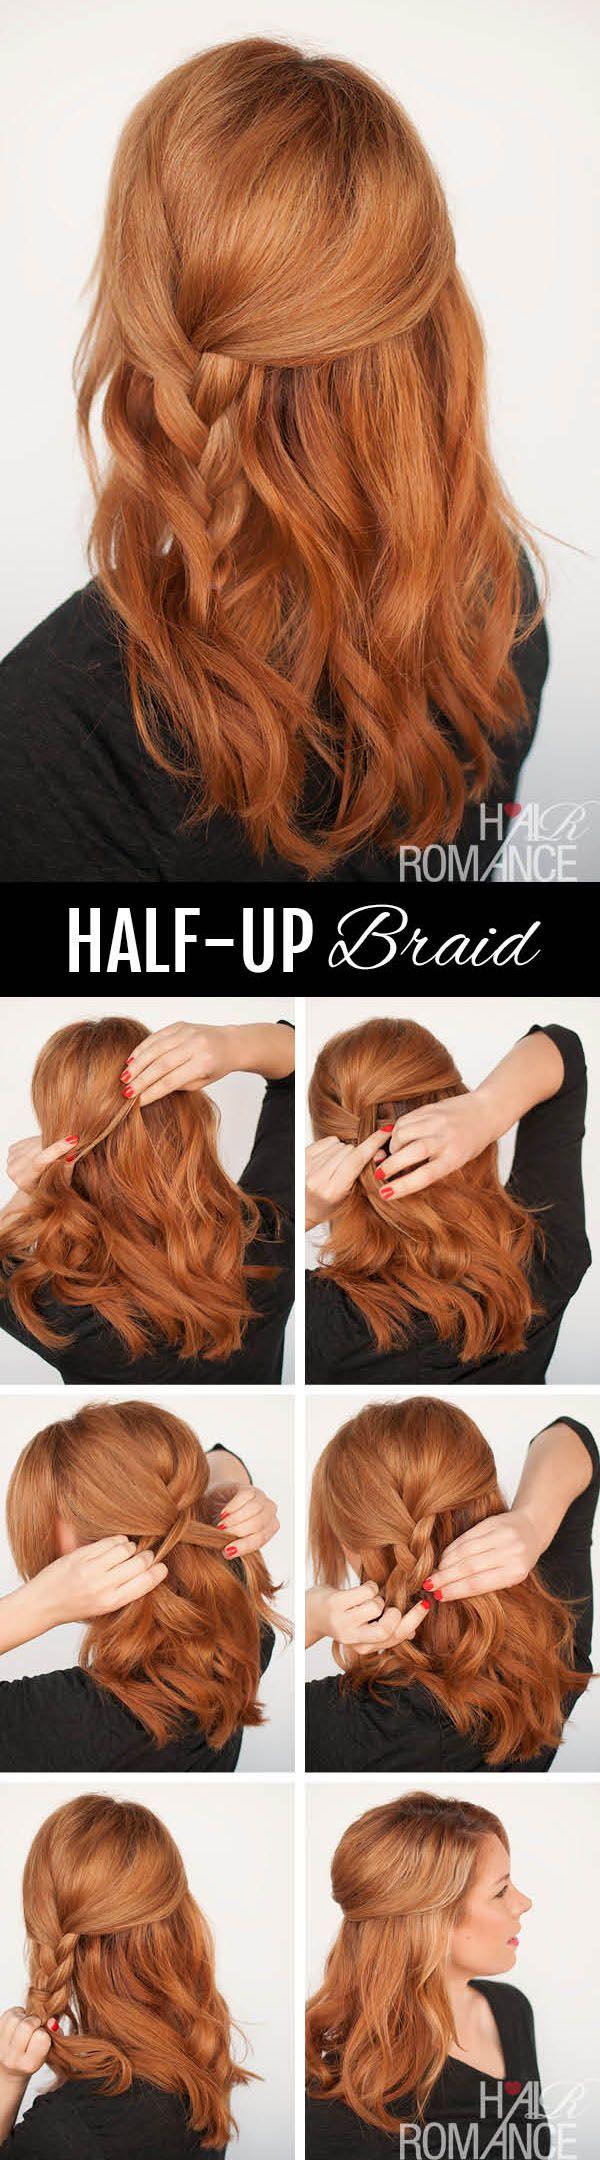 Half Up Braided Hairstyle Tutorial